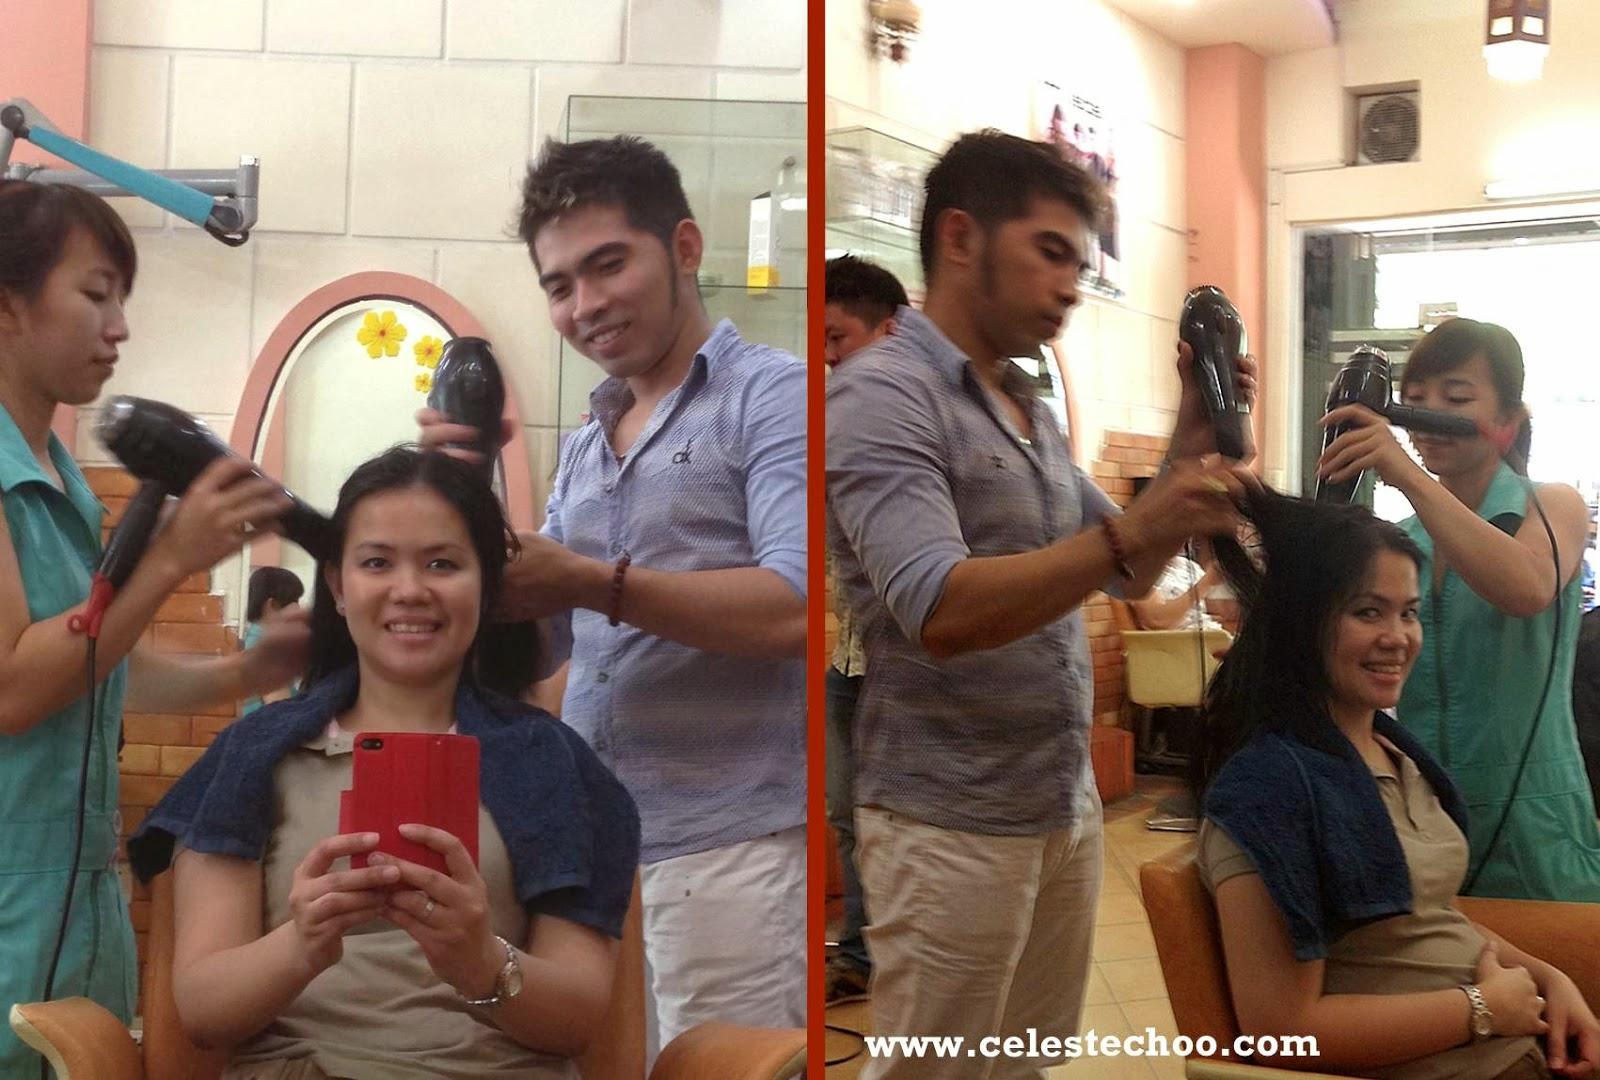 image-hair-salon-in-ho-chi-minh-vietnam